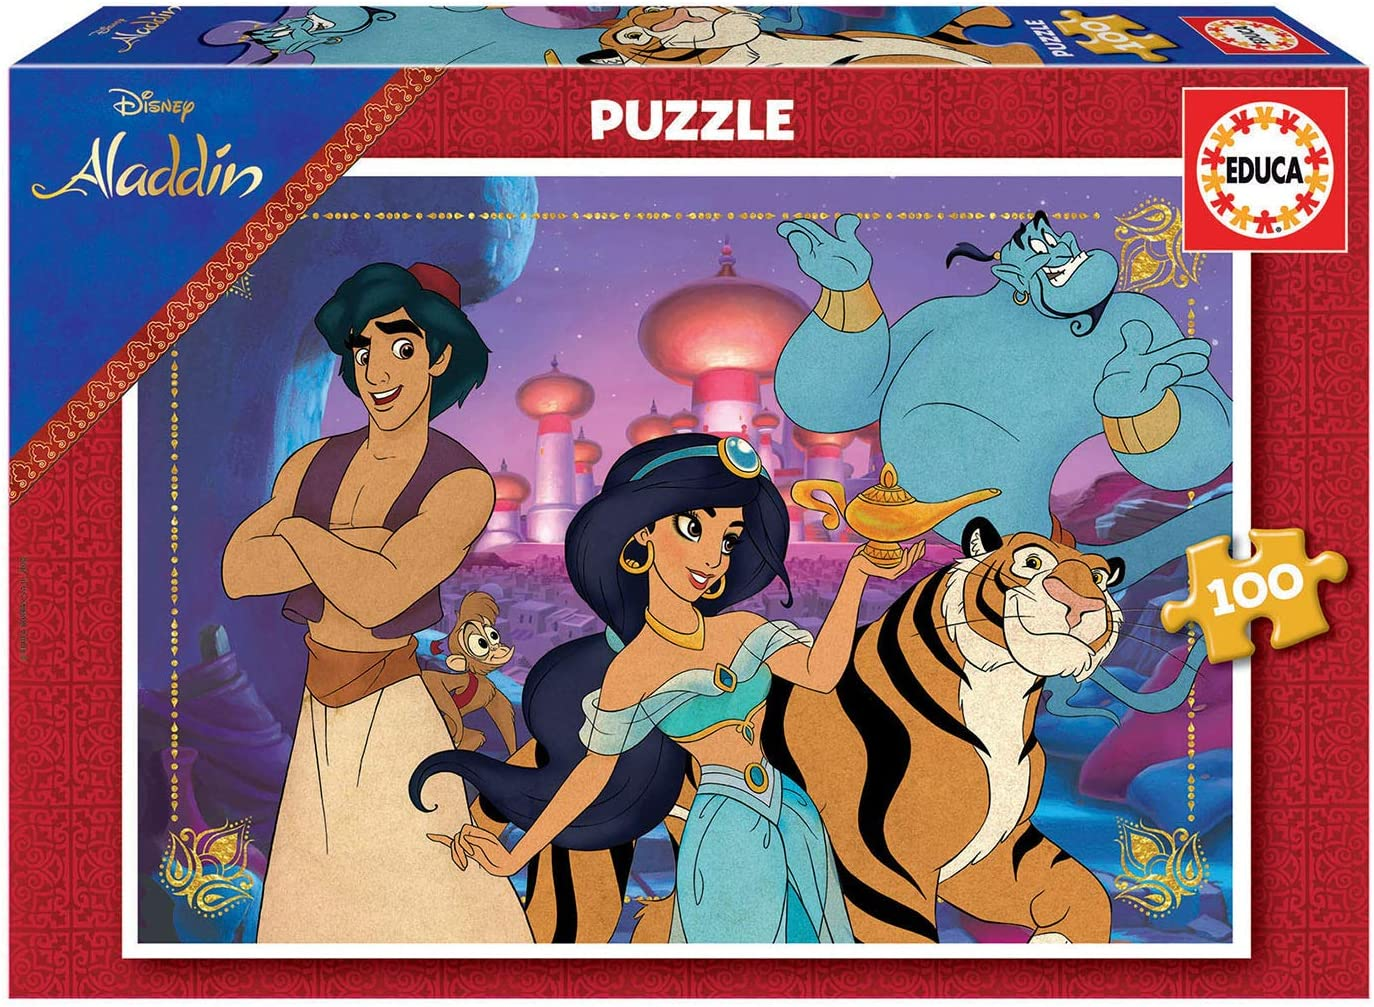 Educa- Aladdin Puzzle Infantil de 100 Piezas, a Partir de 6 años (18639)